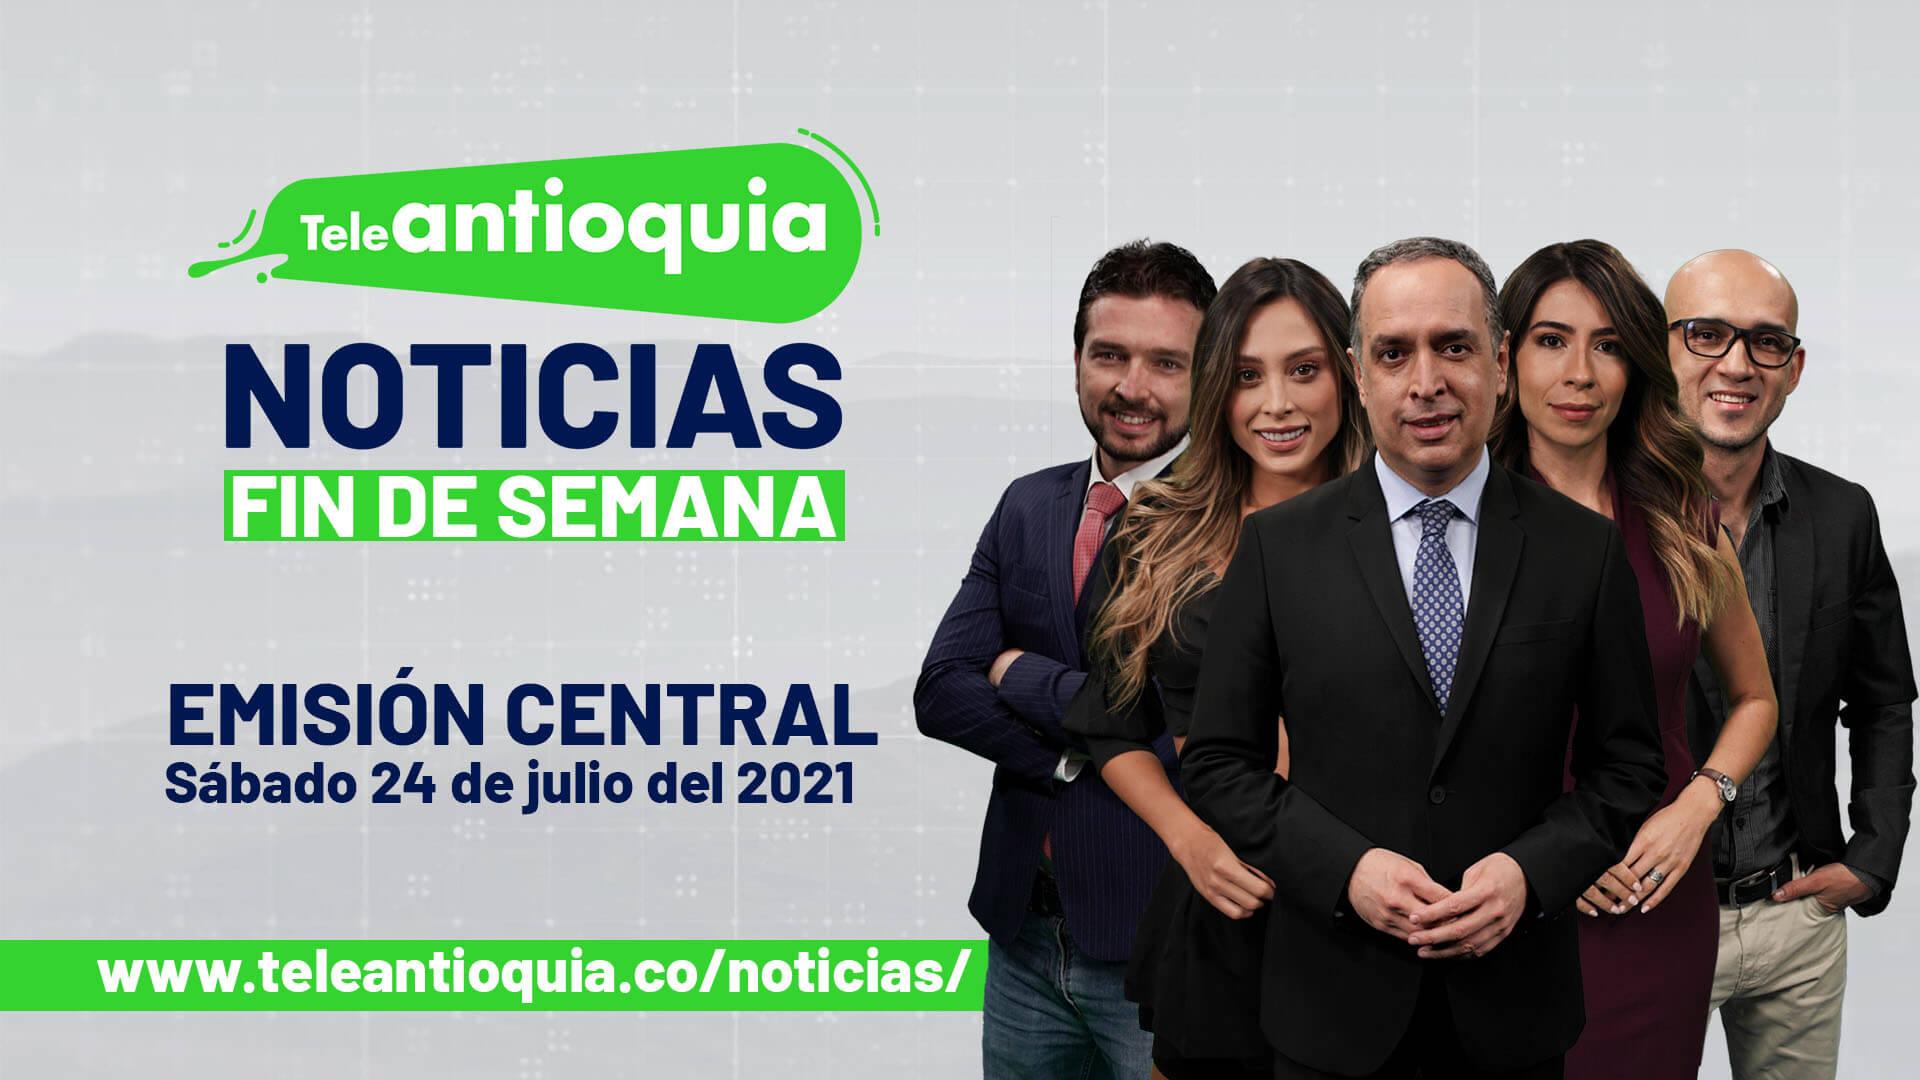 Teleantioquia Noticias – sábado 24 de julio de 2021 noche